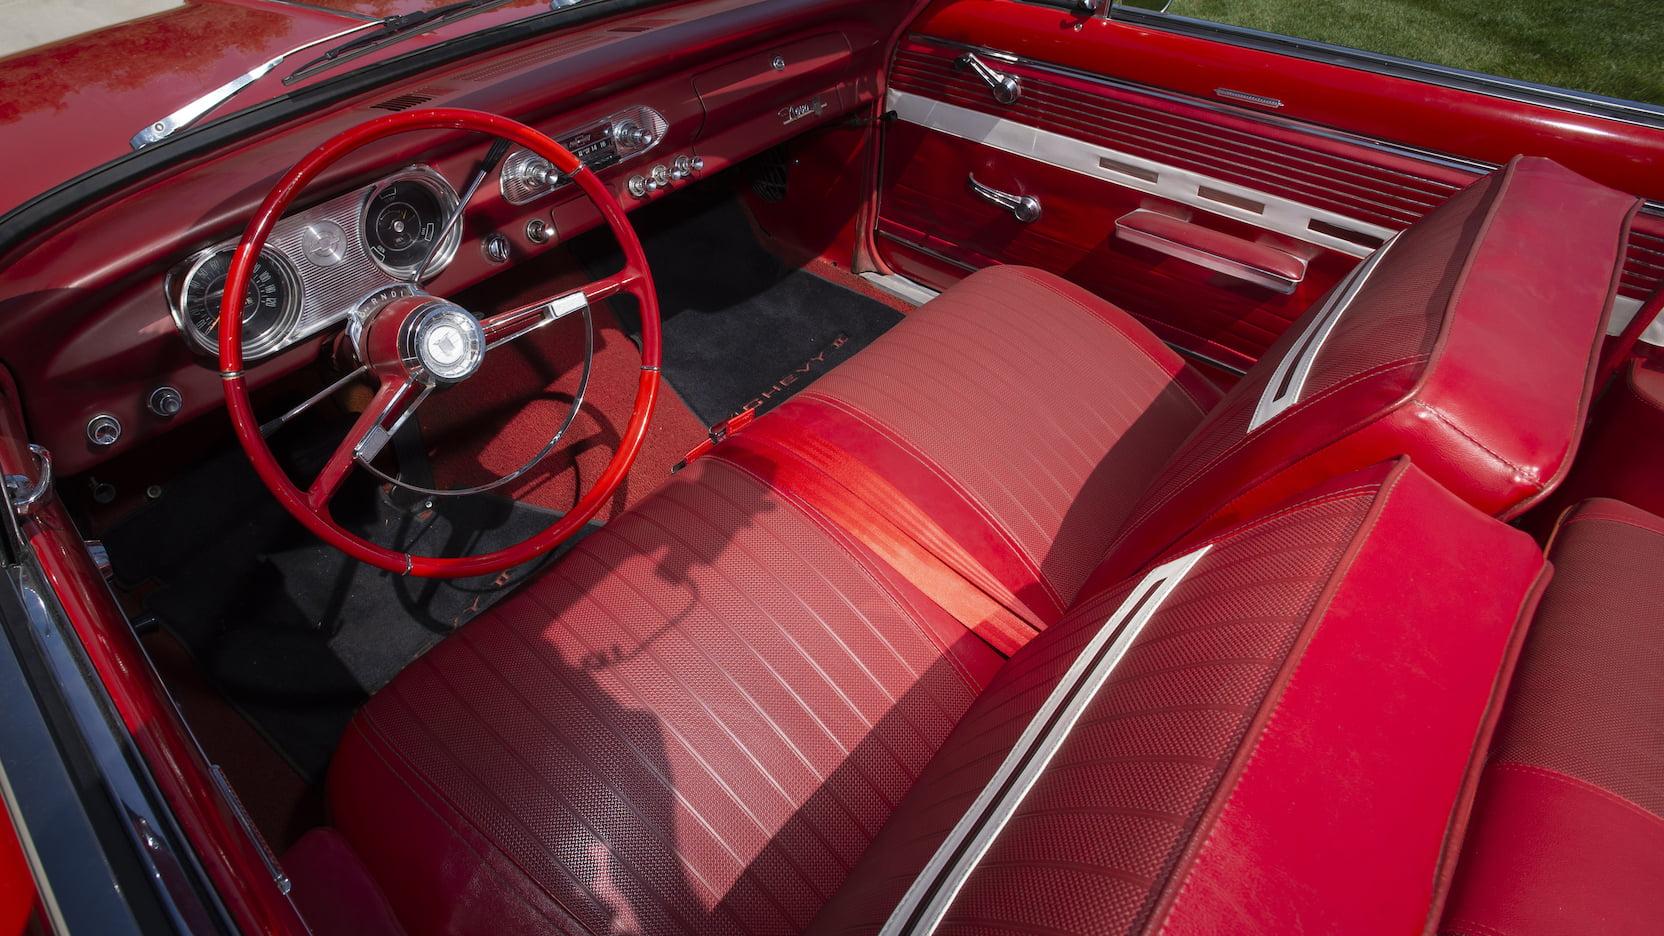 1962 Chevrolet Chevy II Nova 400 interior